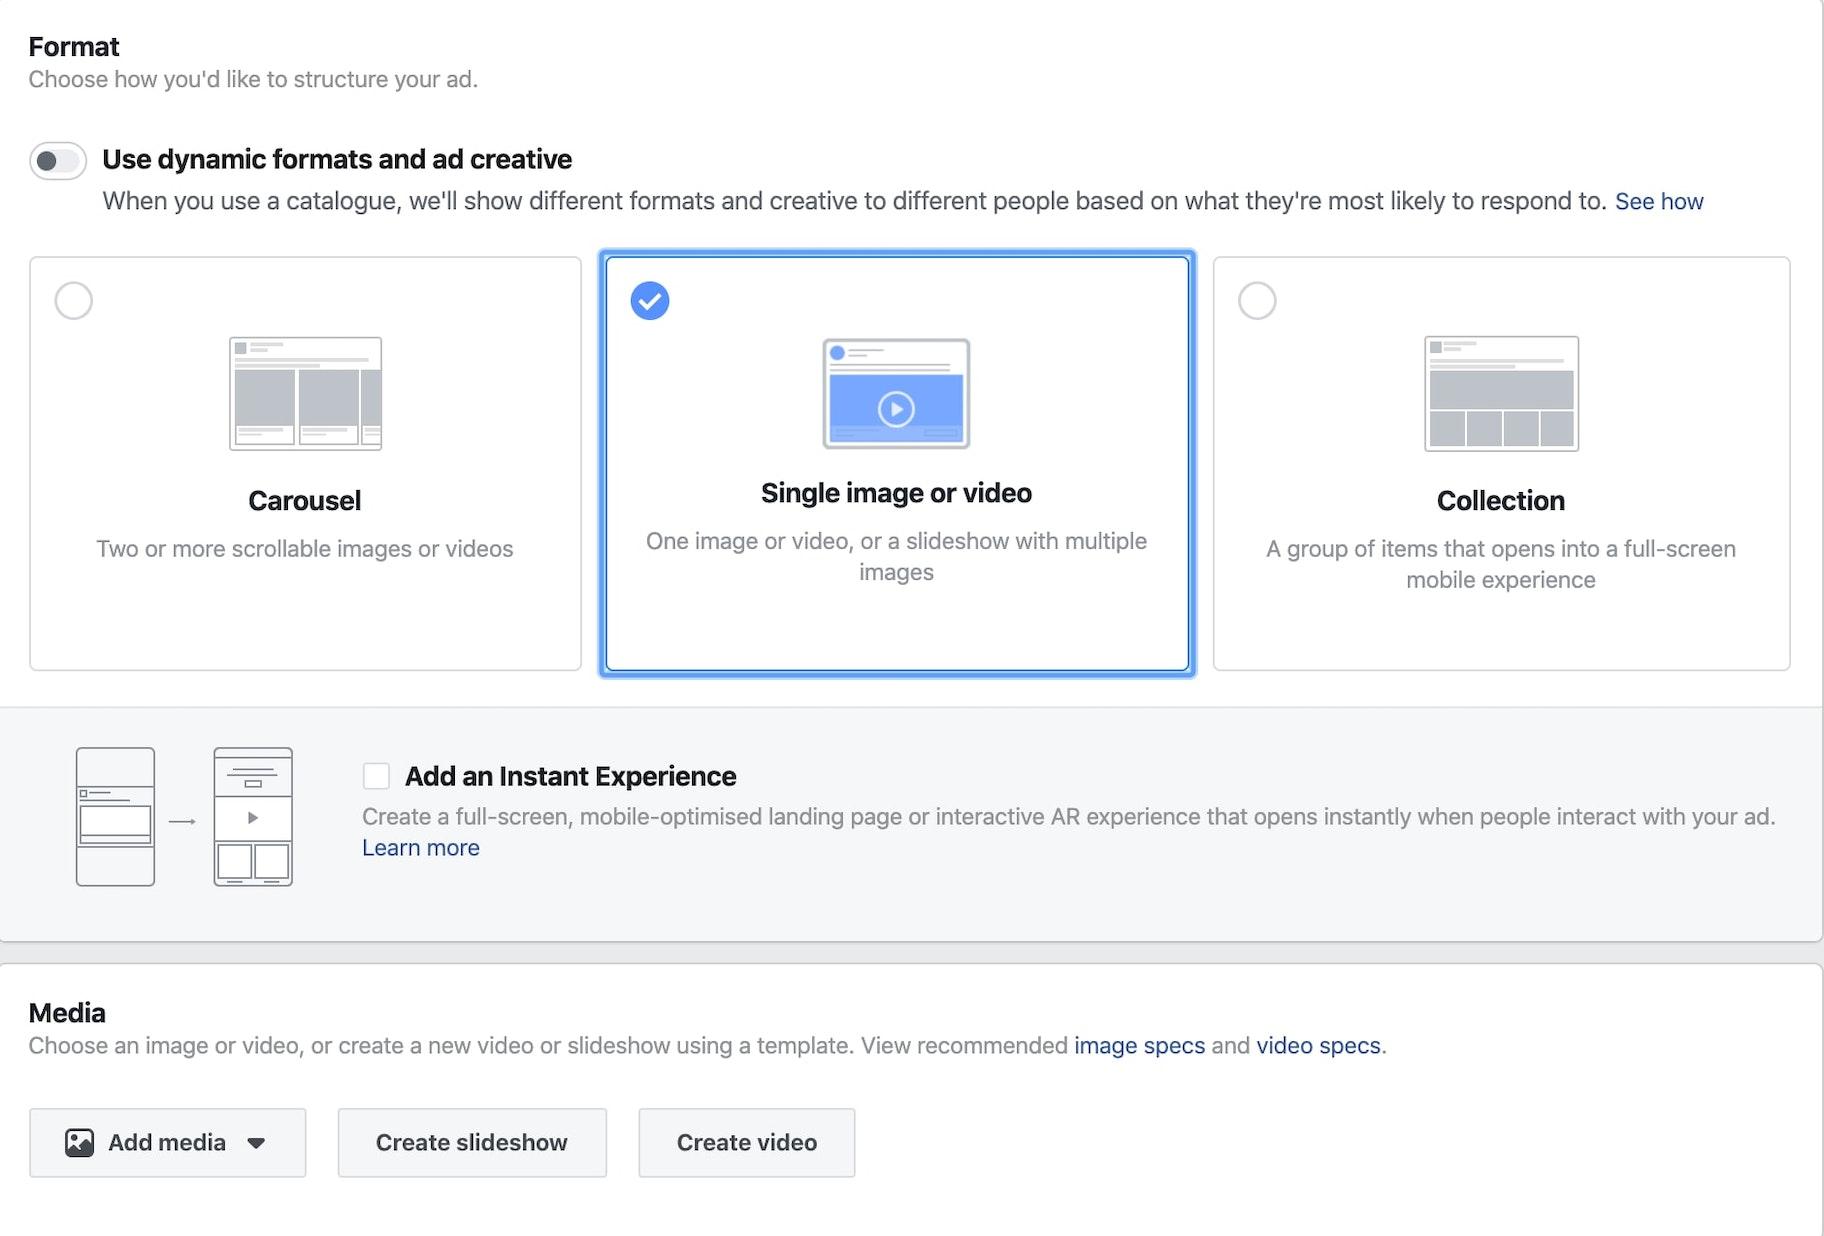 A screenshot from Facebook Ads Manager